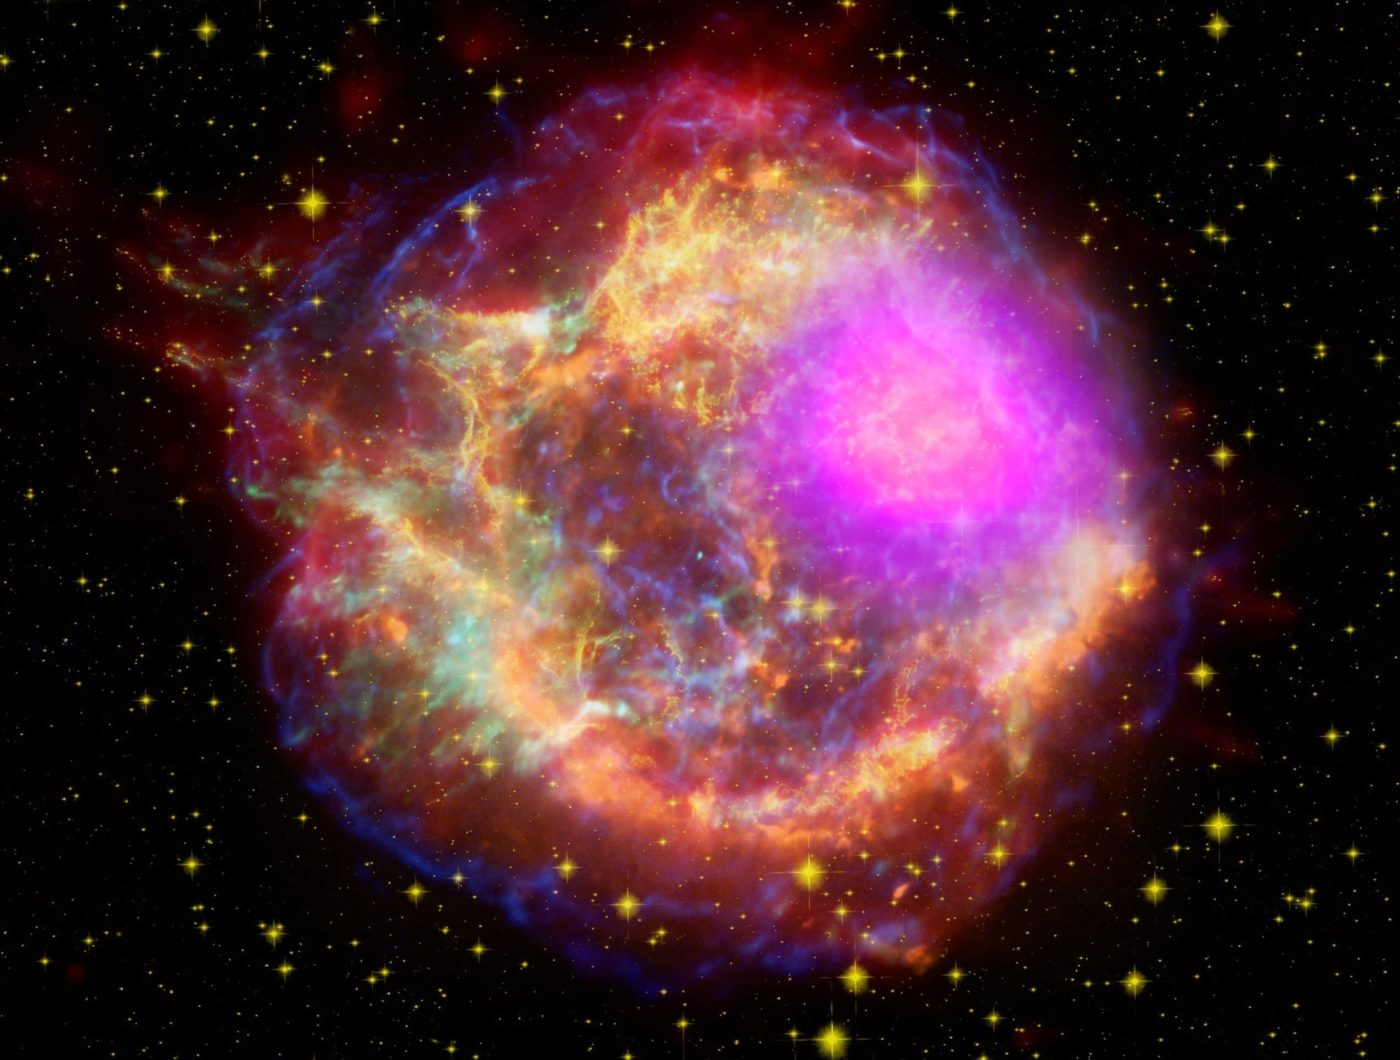 Image credit: NASA/DOE/Fermi LAT Collaboration, CXC/SAO/JPL-Caltech/Steward/O. Krause et al., and NRAO/AUI